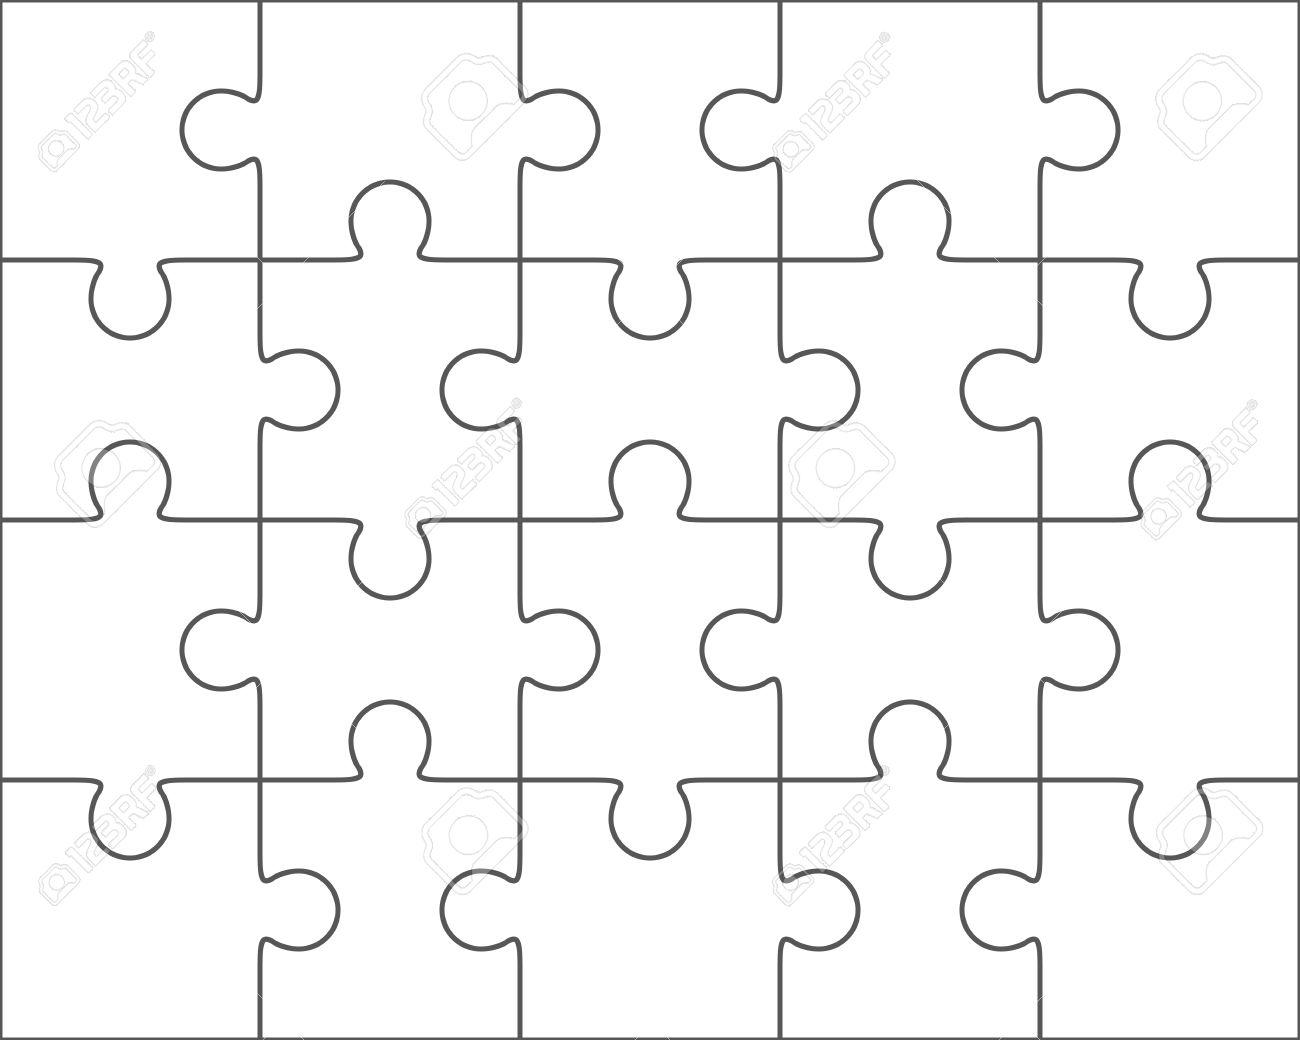 jig saw puzzle template | goseqh.tk